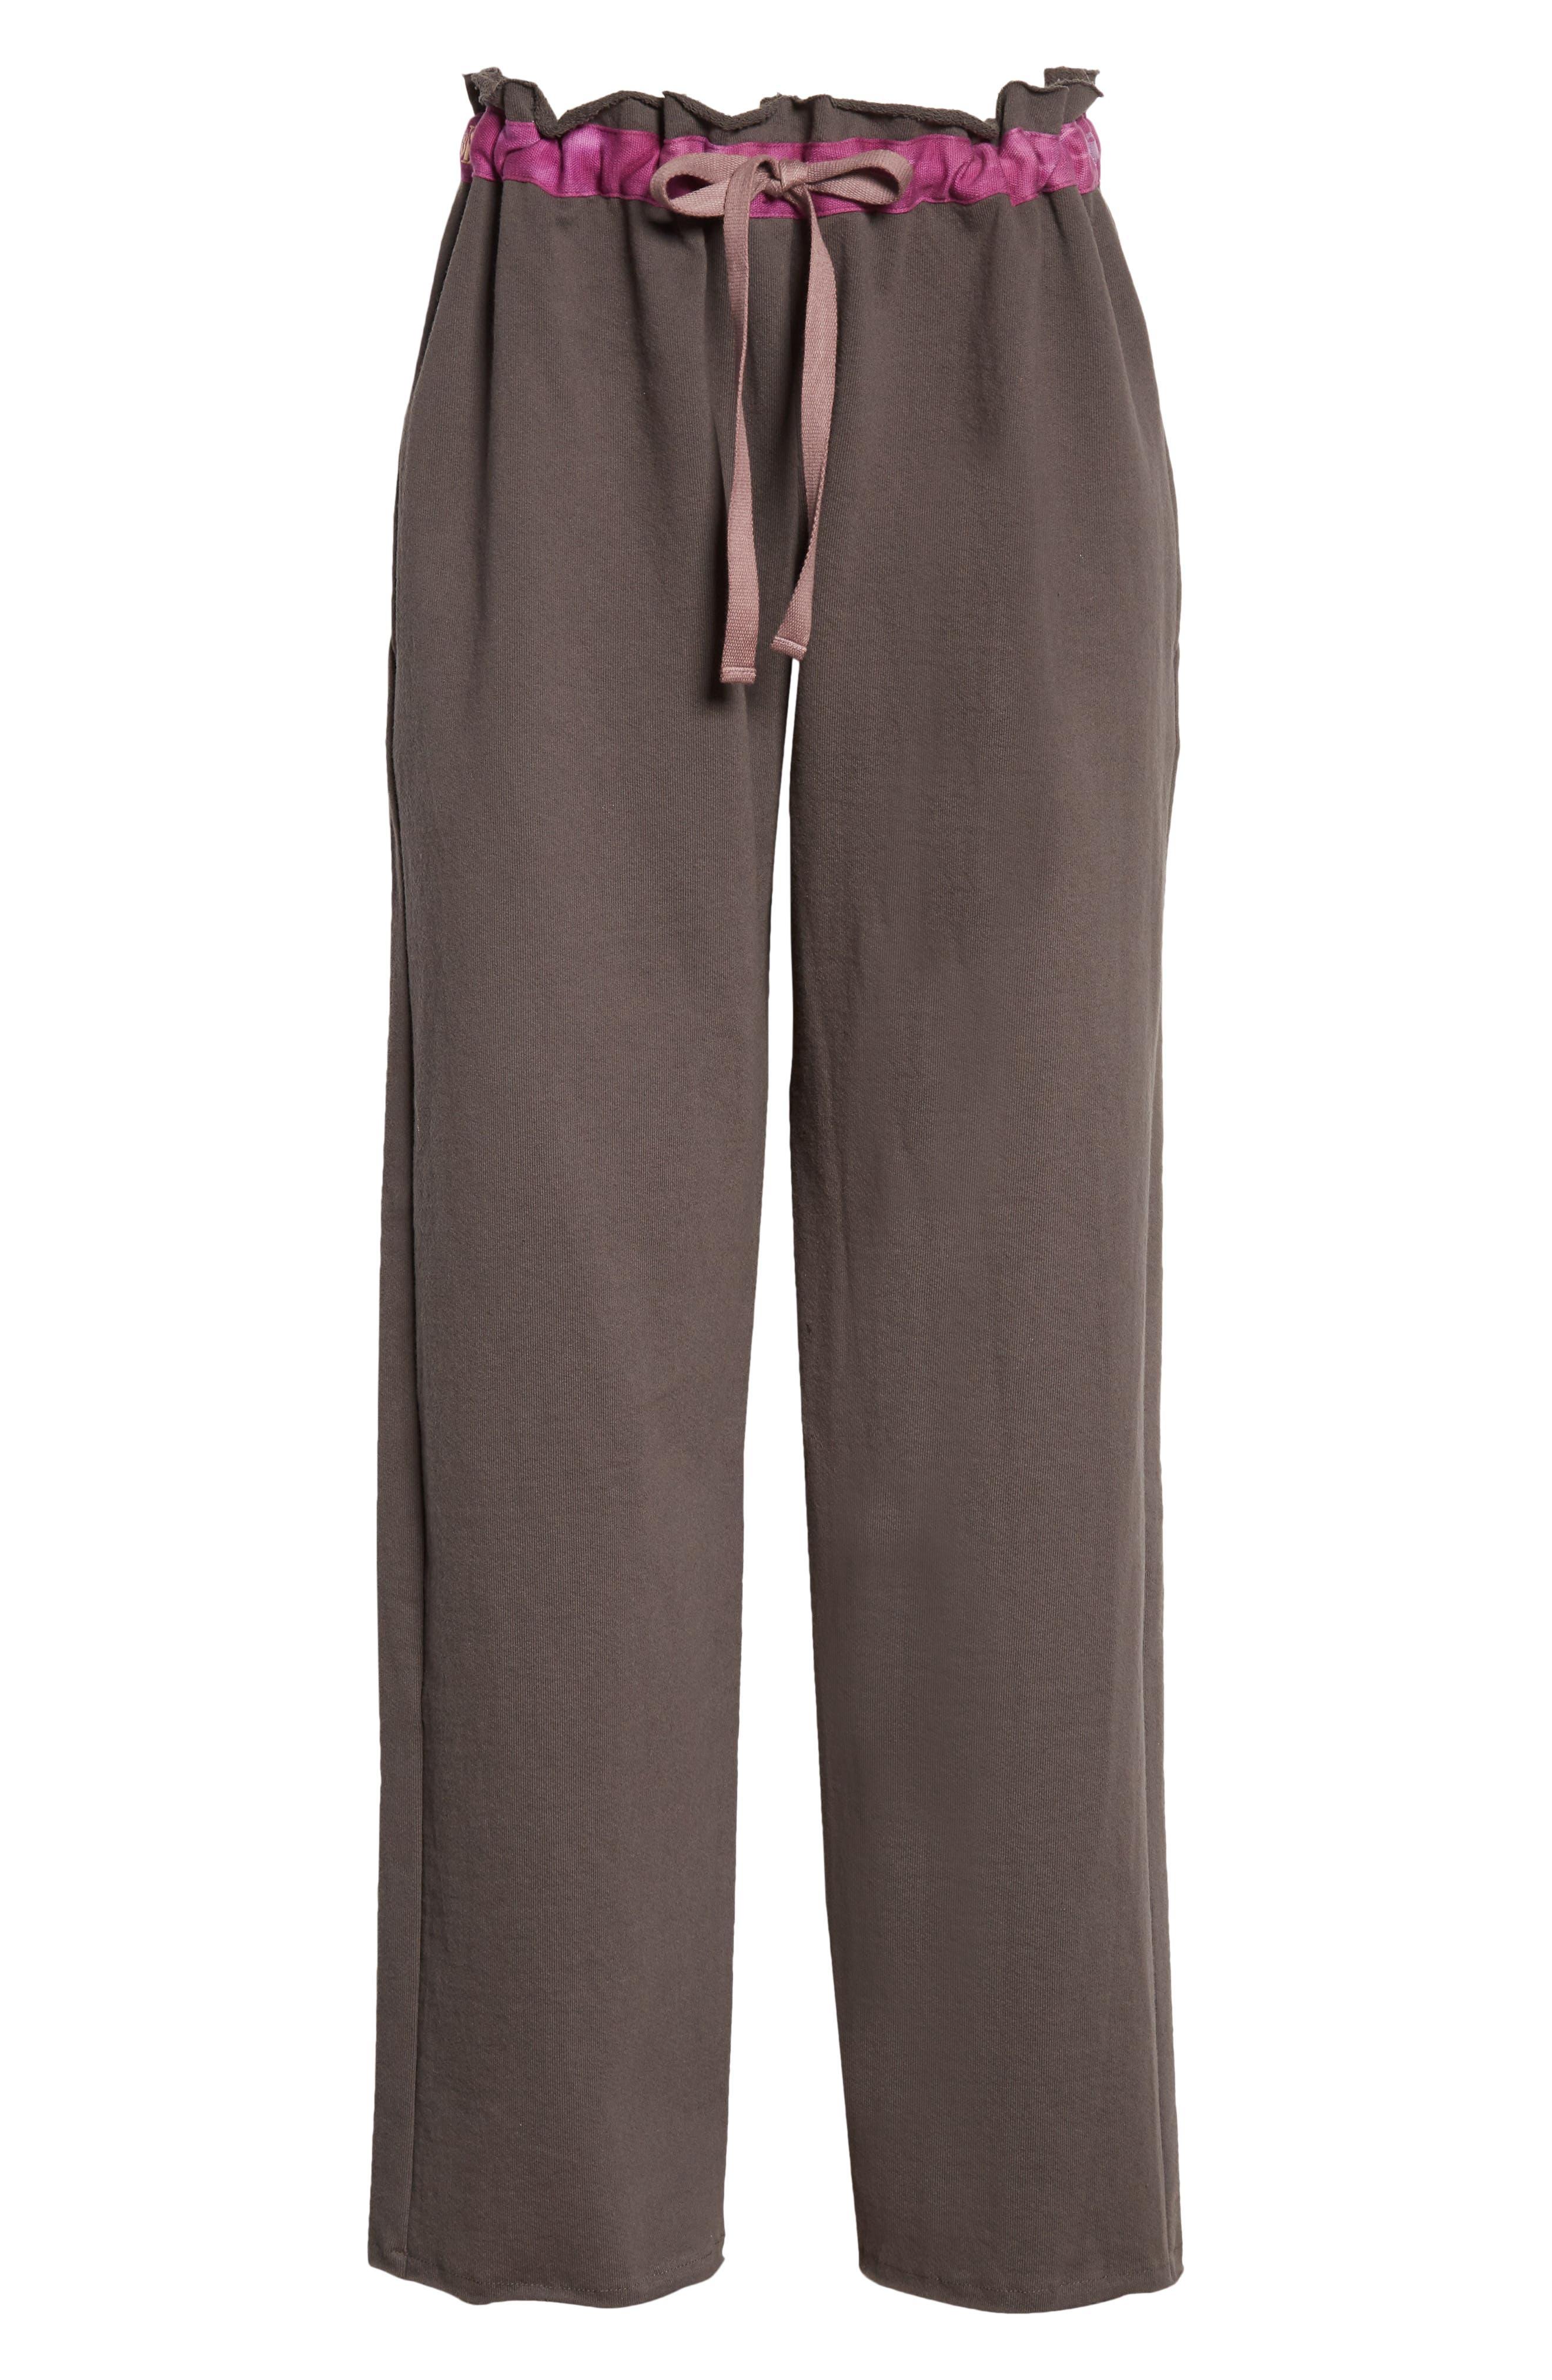 Women's Bephies Beauty Supply High Waist Straight Leg Sweatpants